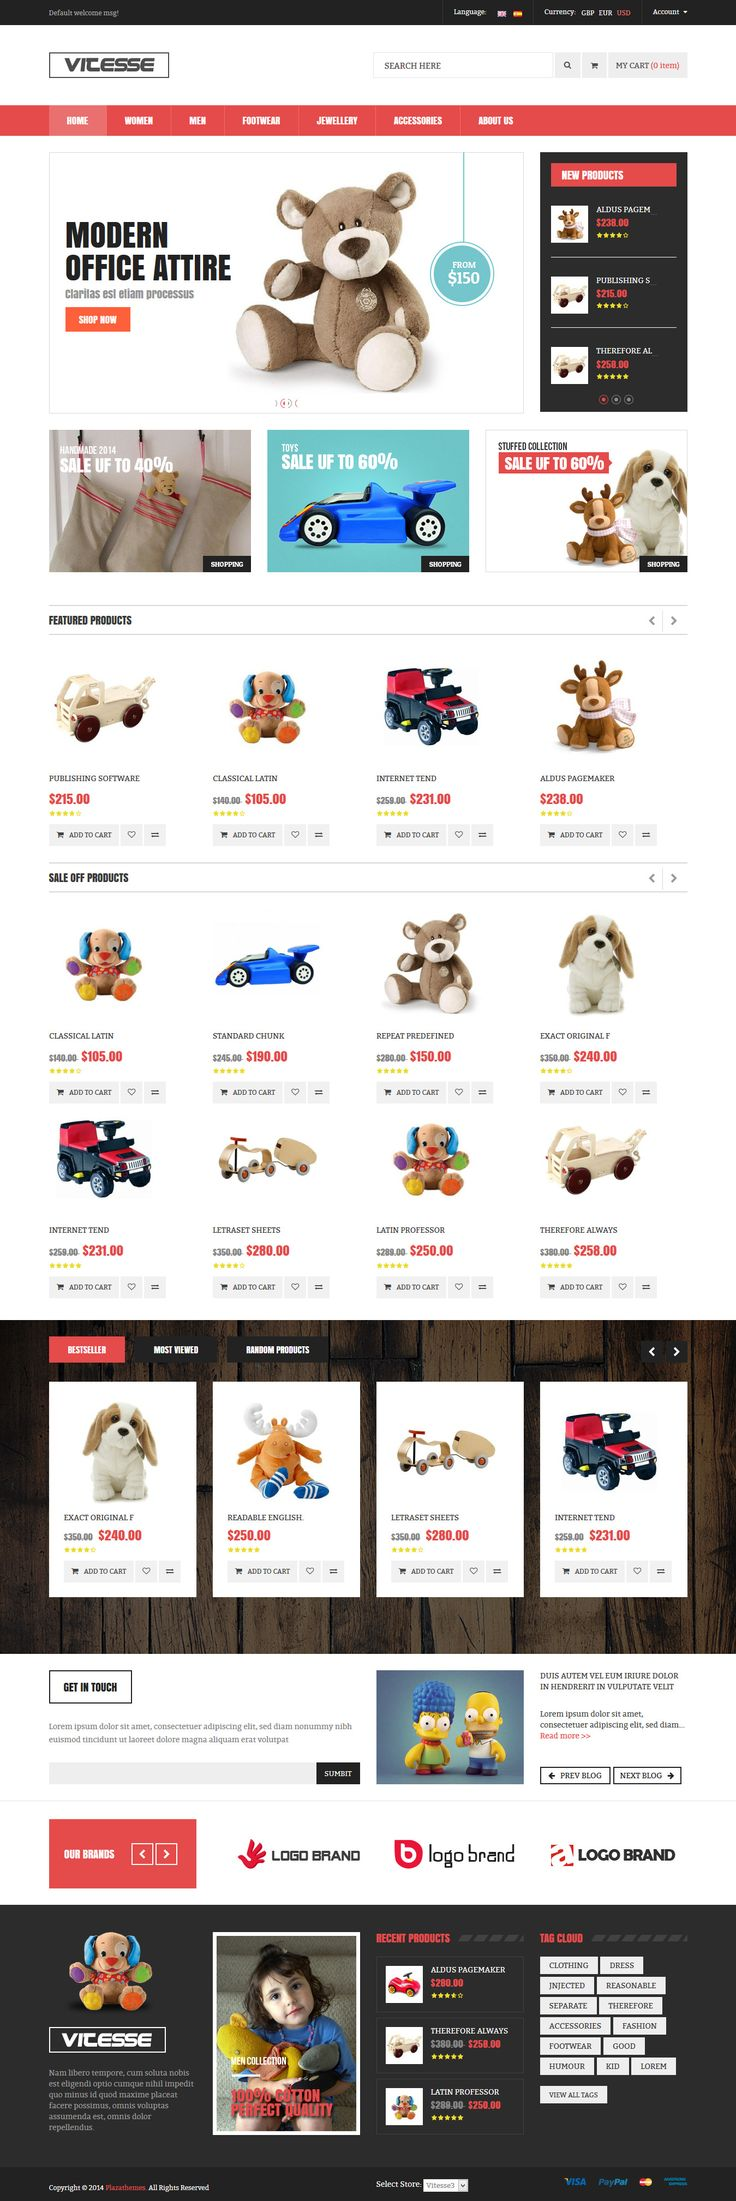 Responsive Multi Store Magento Theme #ecommerce #website Download: http://themeforest.net/item/vitesse-responsive-multi-store-magento-theme/9528920?ref=ksioks